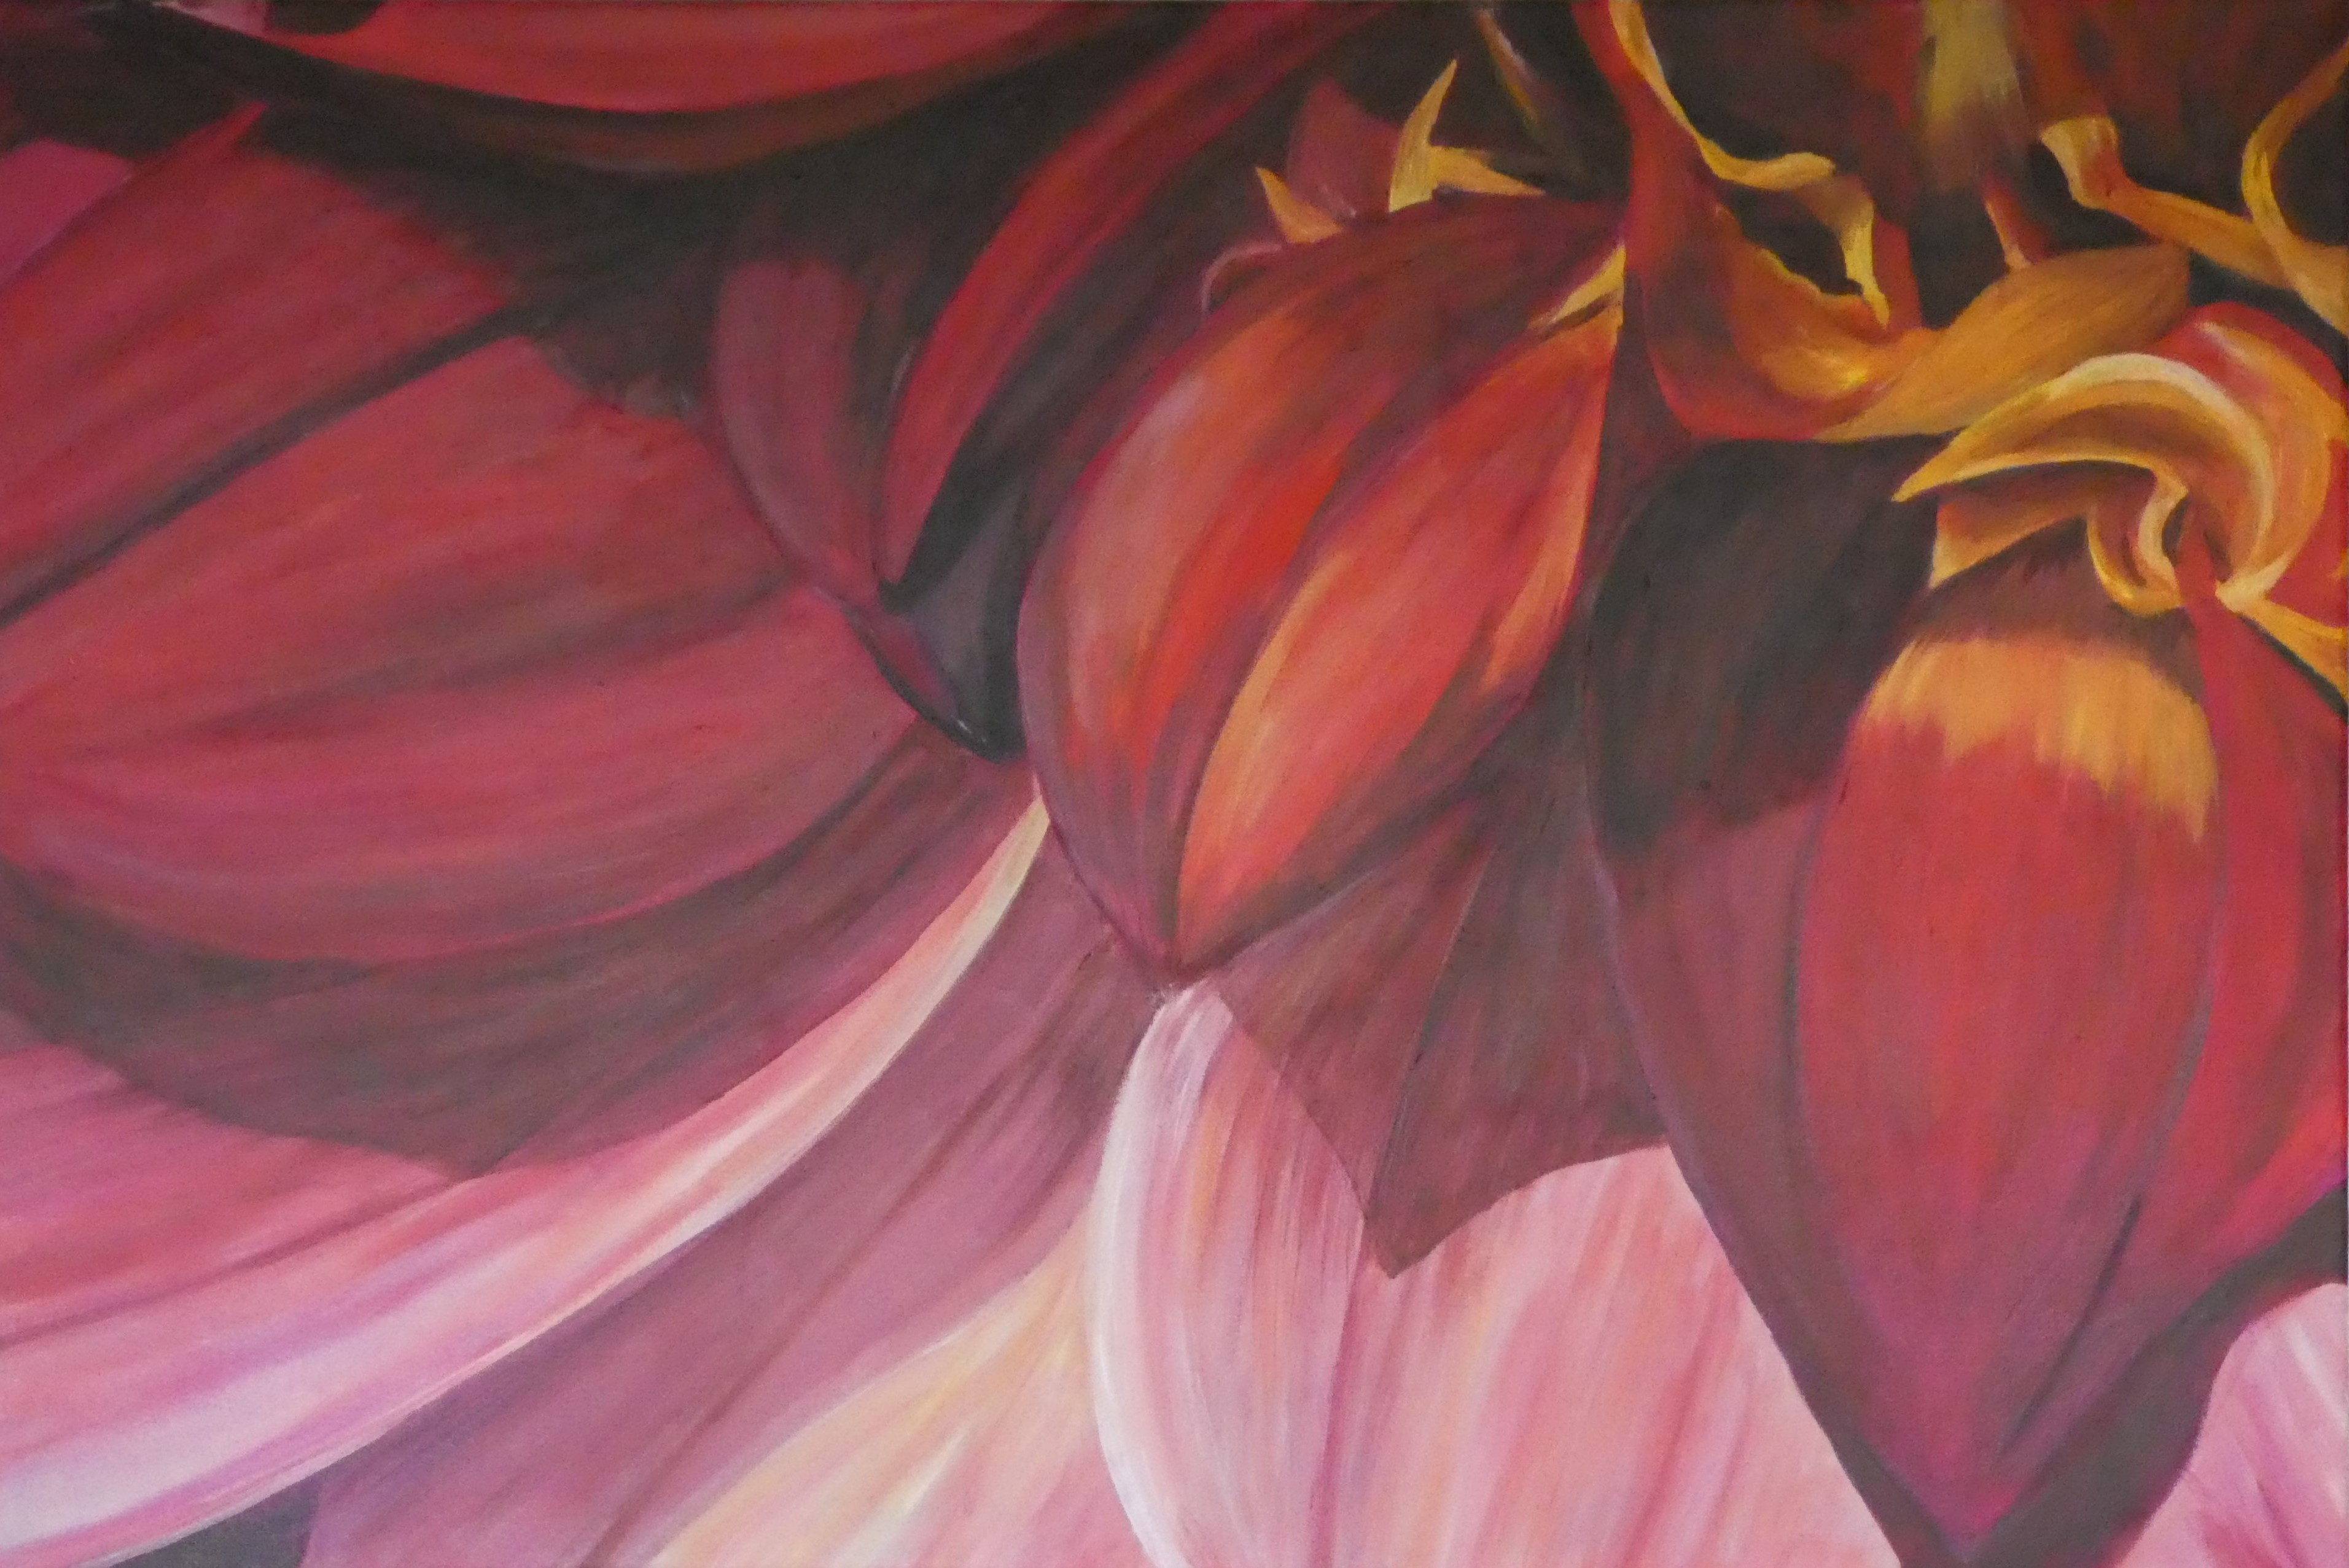 Fiery Dahlia by Audrey Bowling